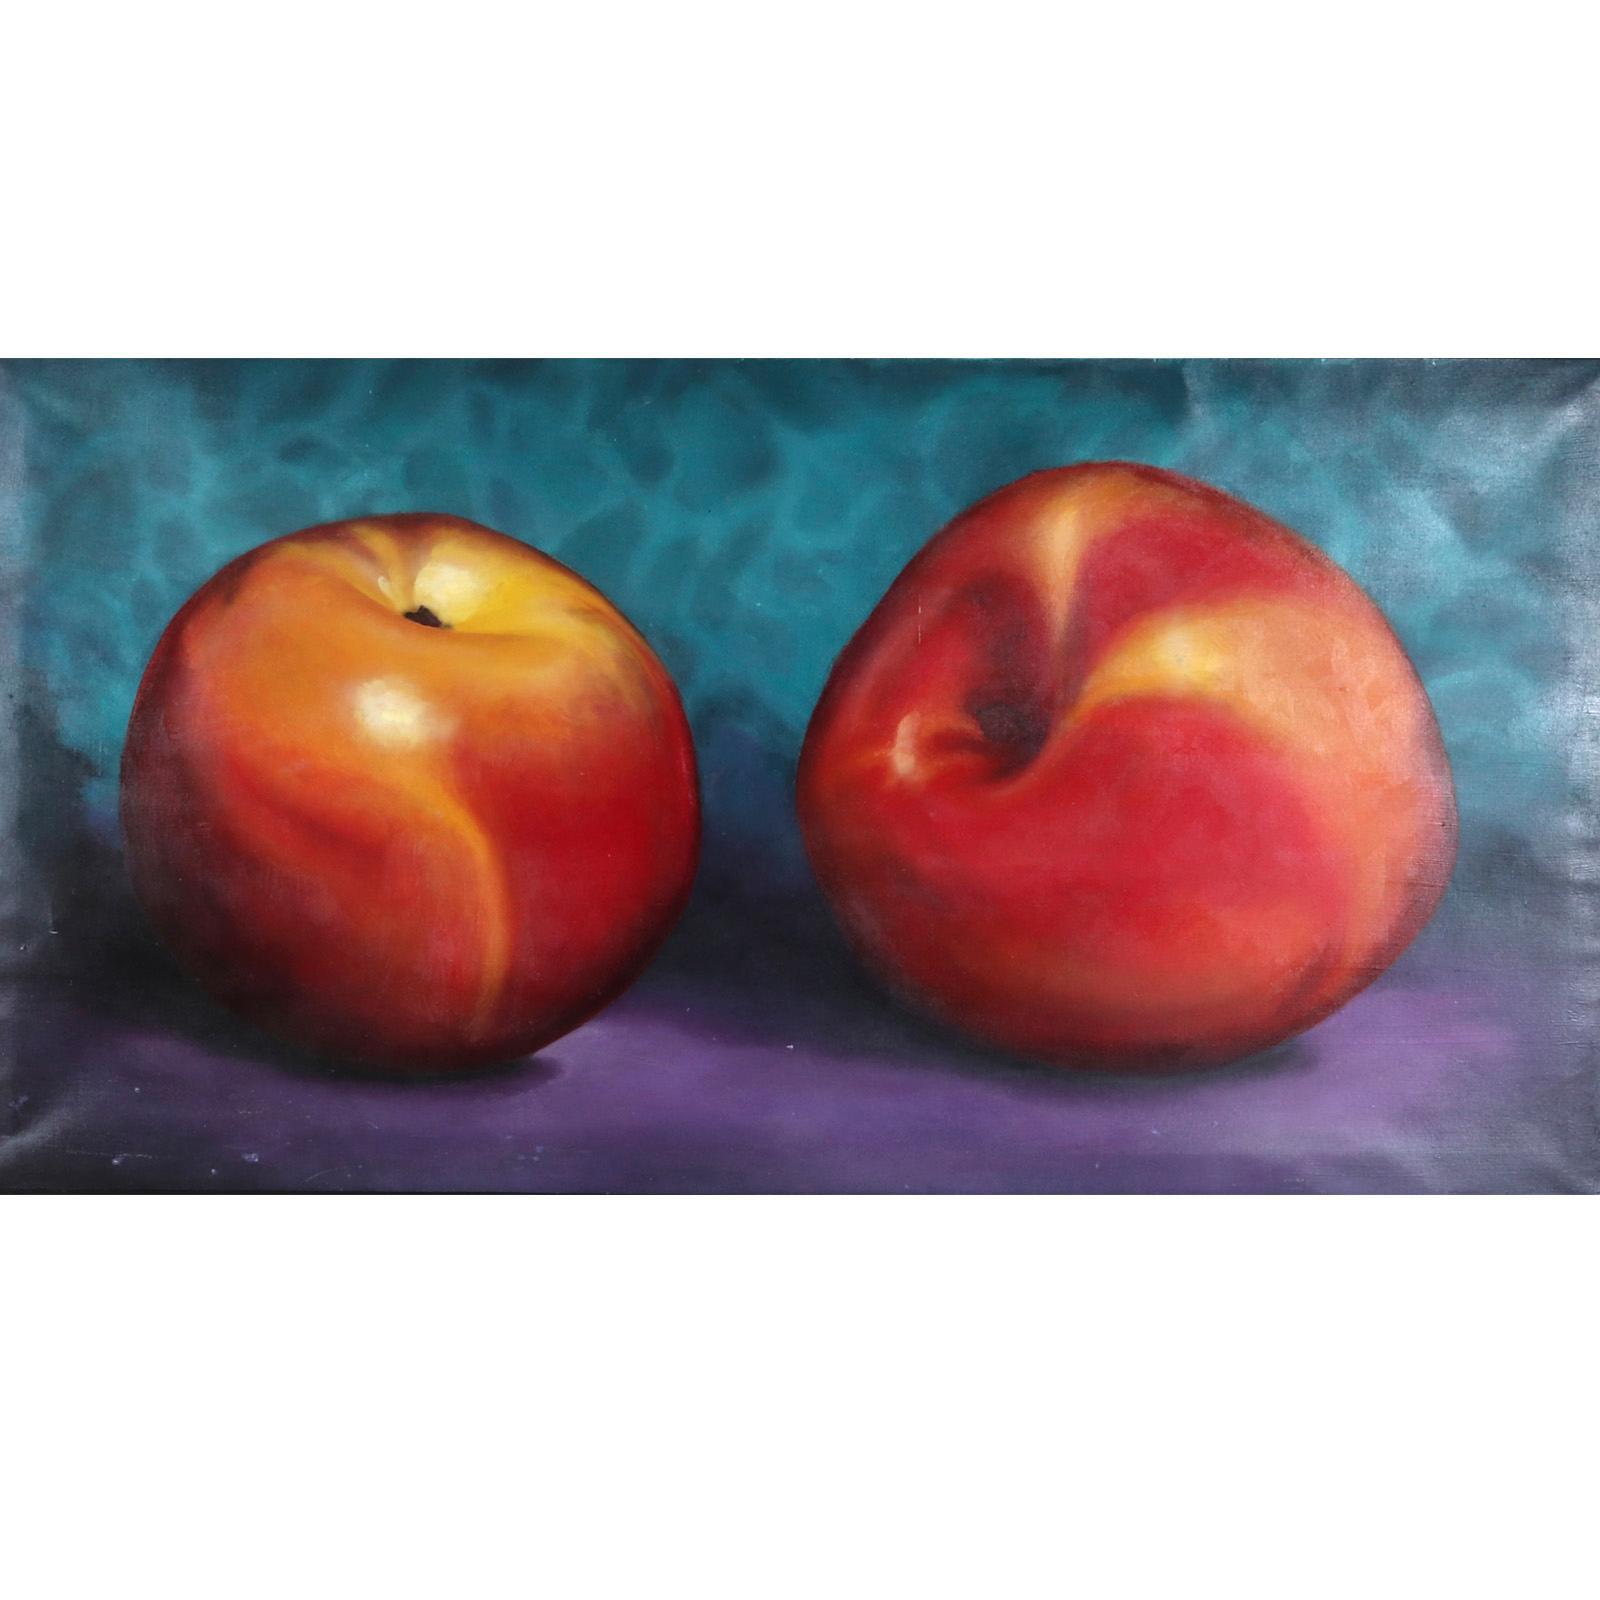 "Tom Seghi, (American, B.1942), Two Apples, 1992, oil on canvas, 40""H x 78""W (image) 41""H x 79""W (frame)"